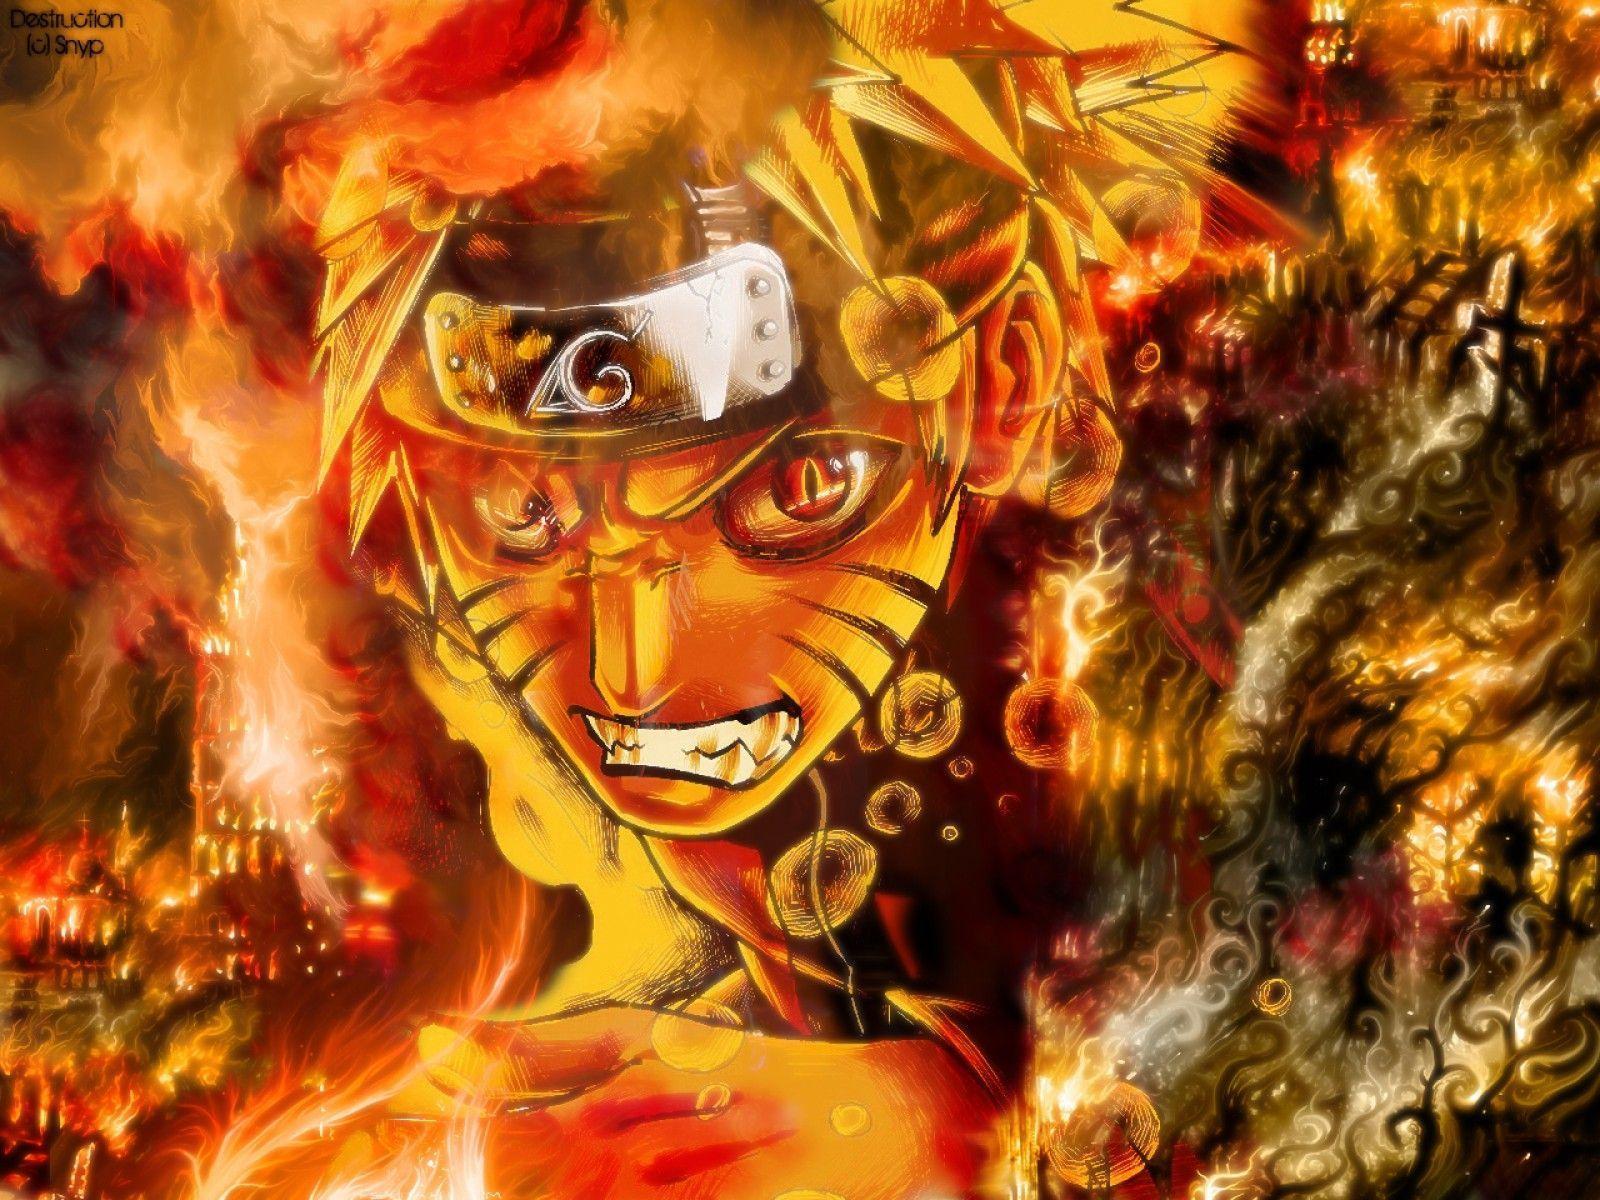 Naruto Shippuden Wallpapers - Wallpaper Cave